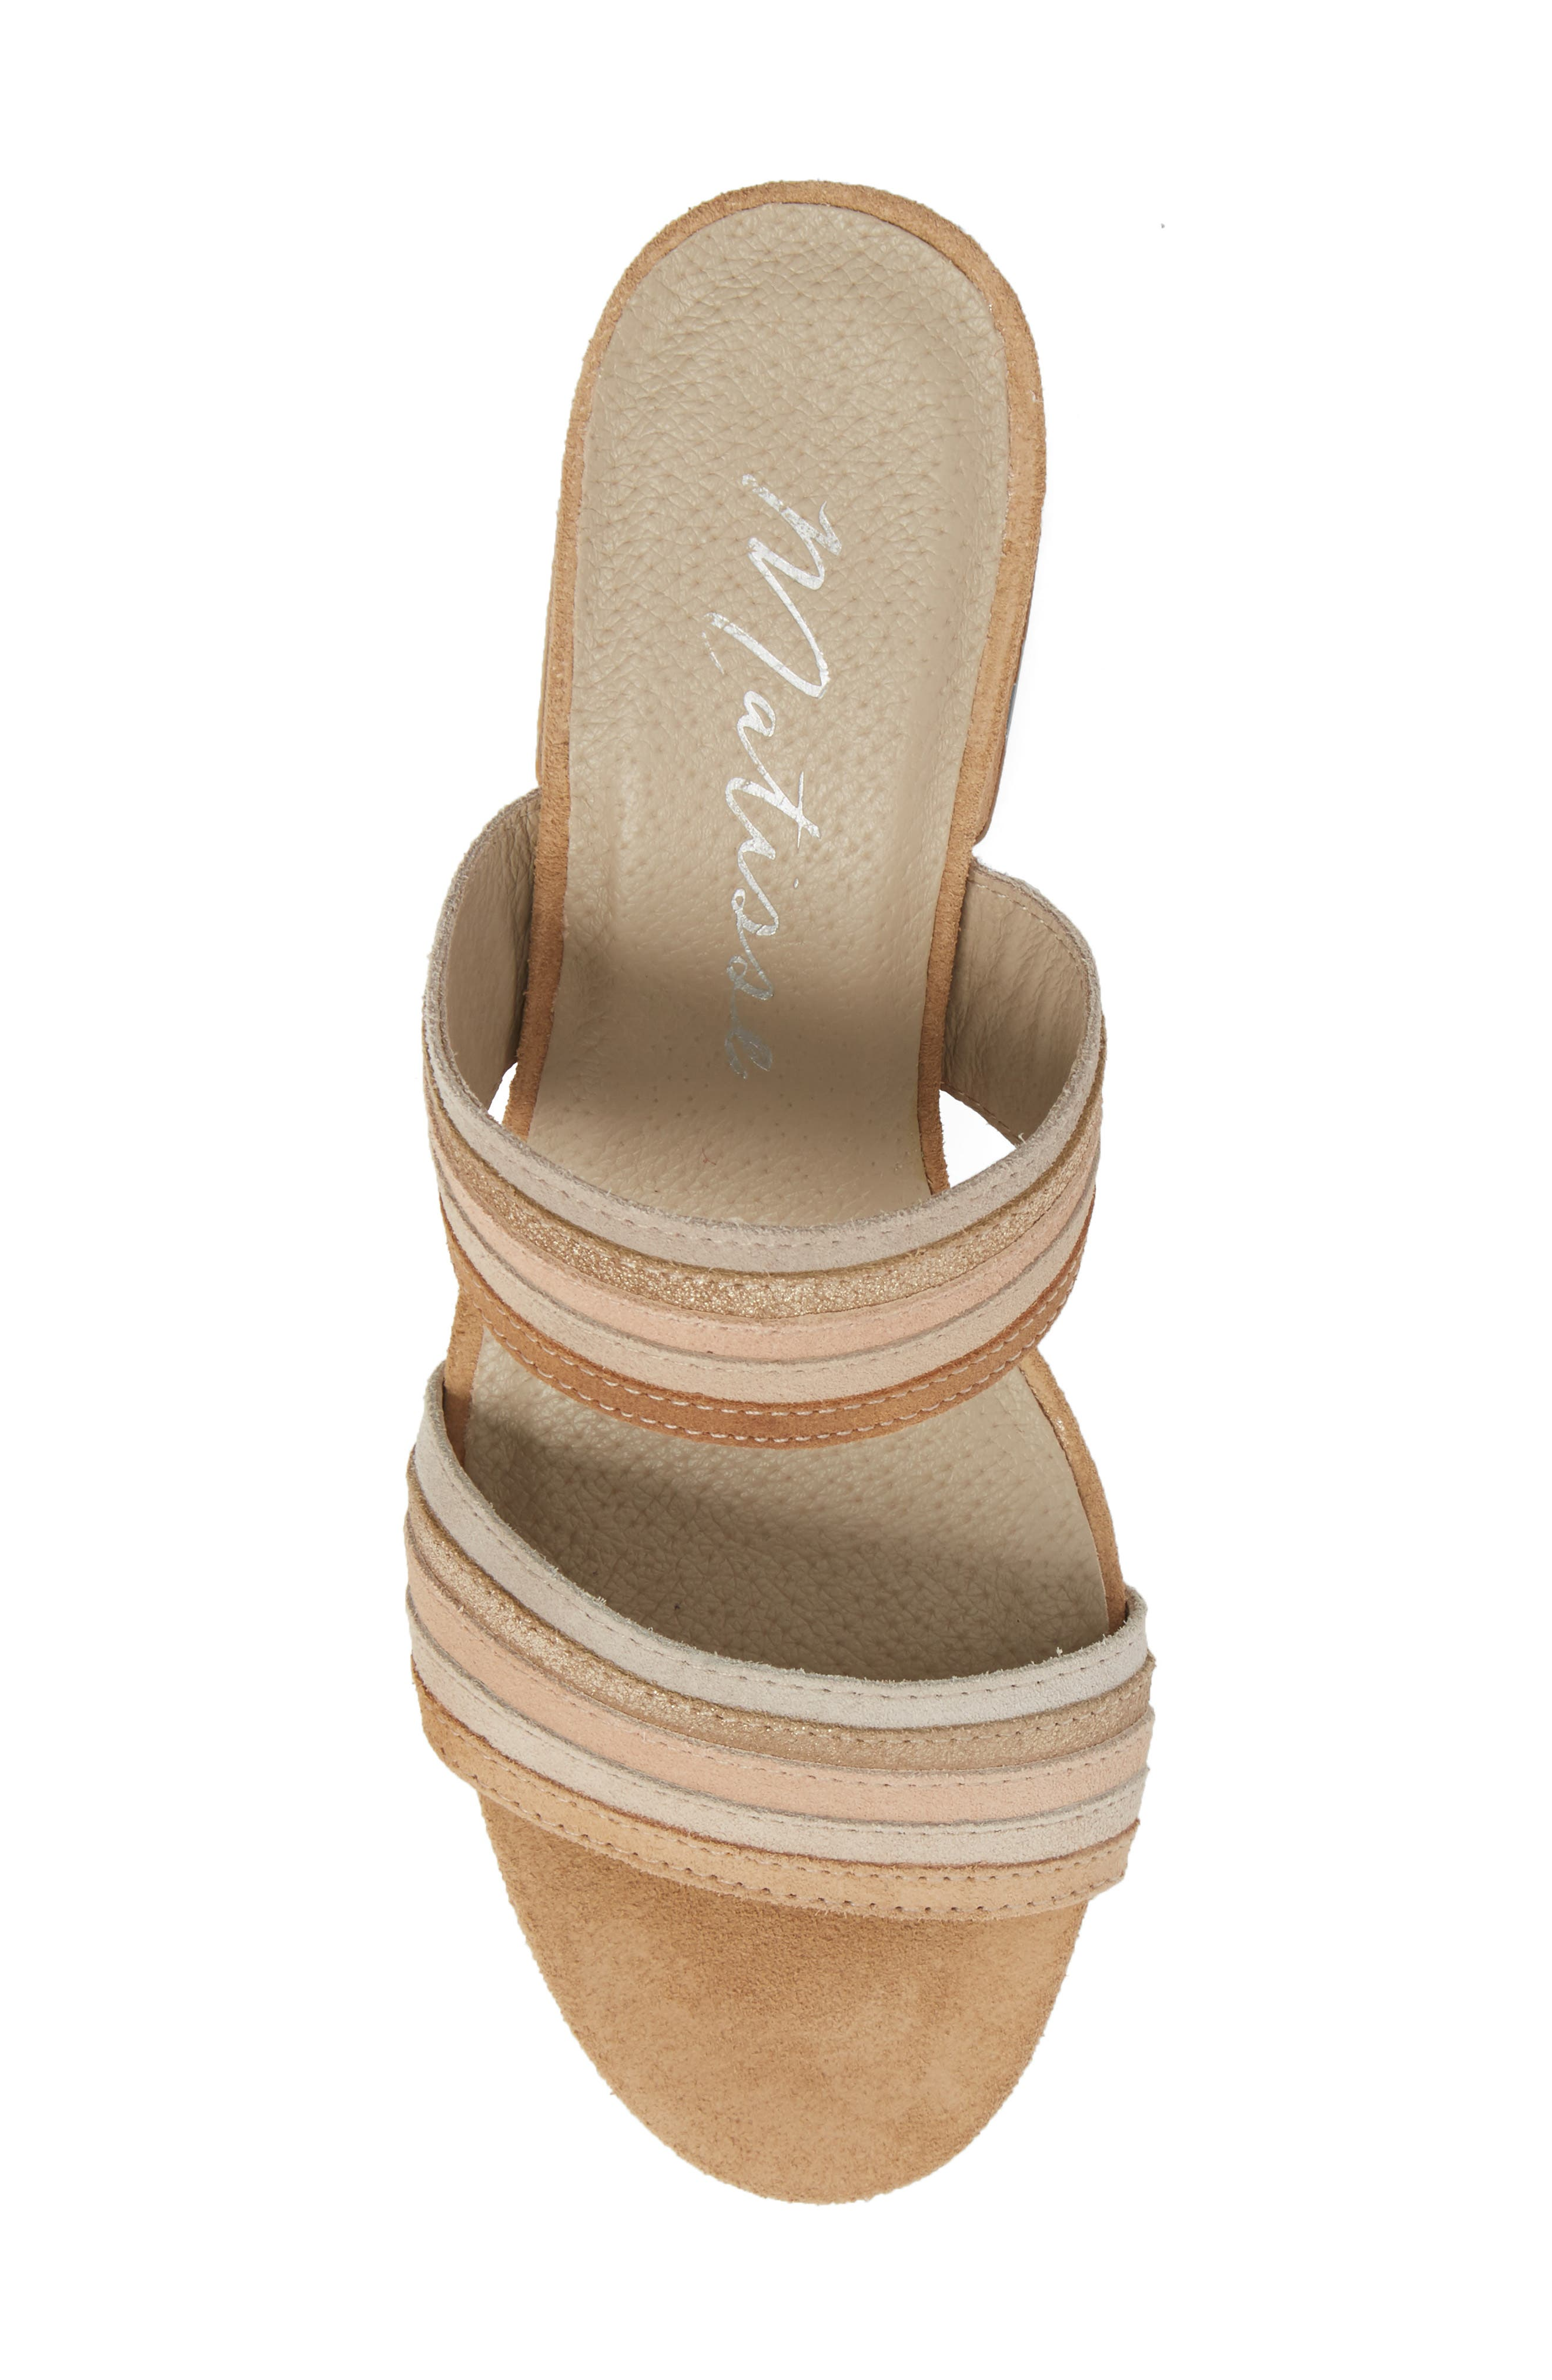 Bonita Slide Sandal,                             Alternate thumbnail 5, color,                             NATURAL SUEDE